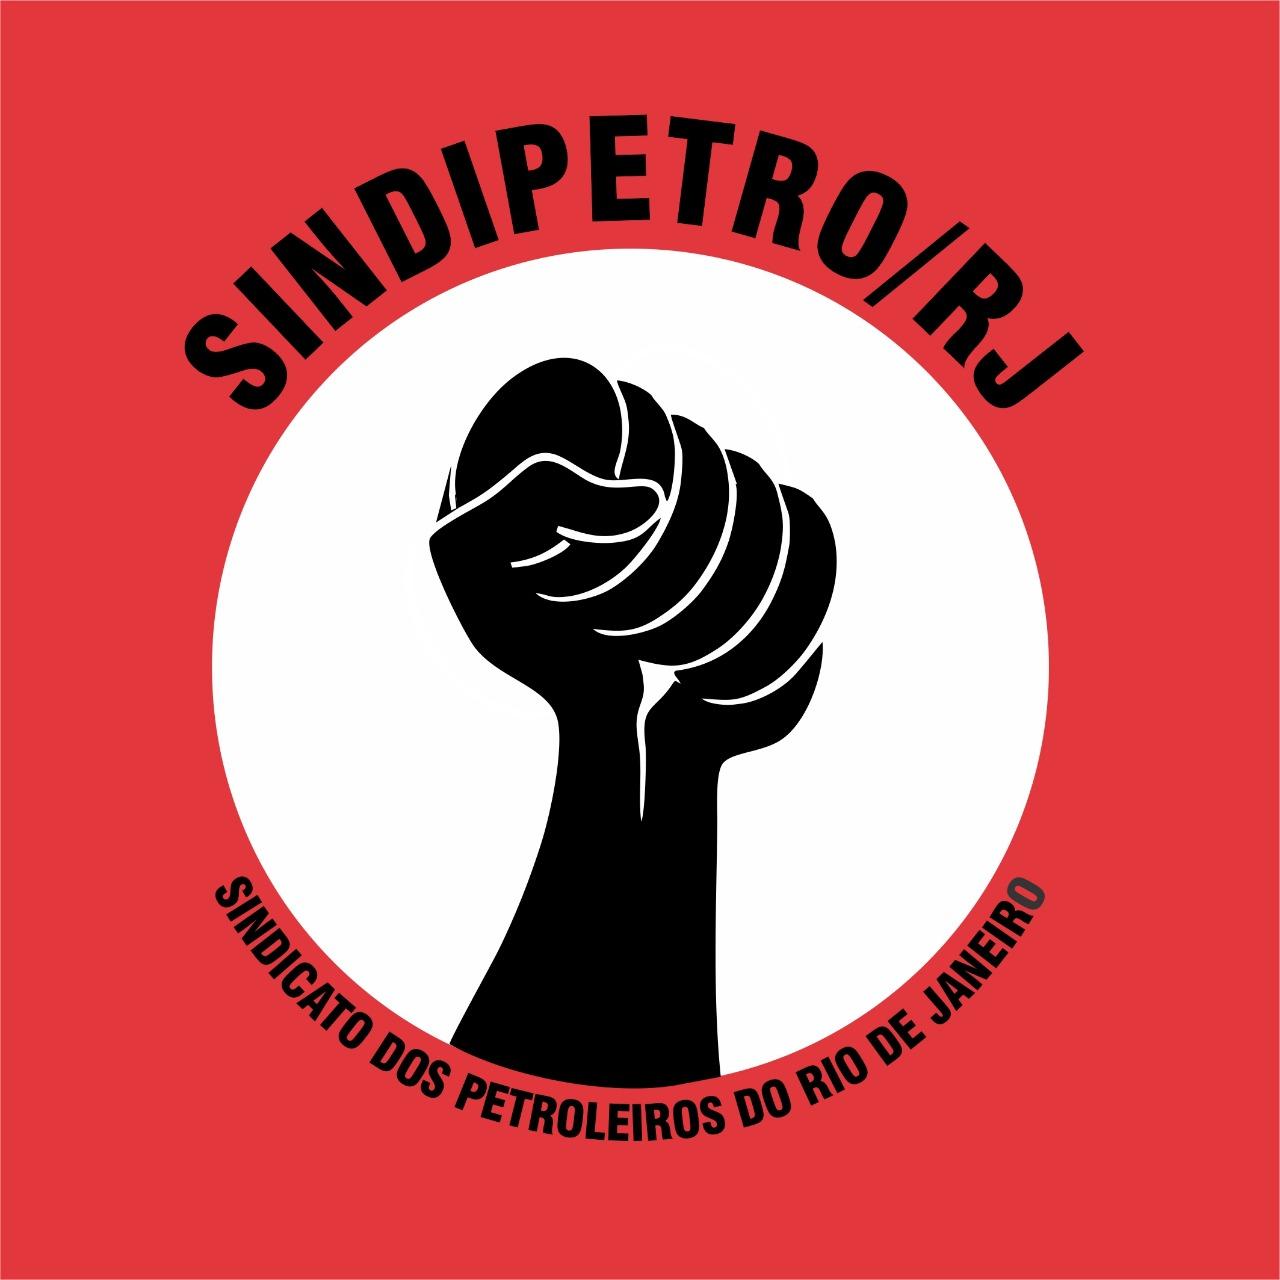 Sindipetro-RJ seleciona estagiários de Direito Logo Sindipetro valendo